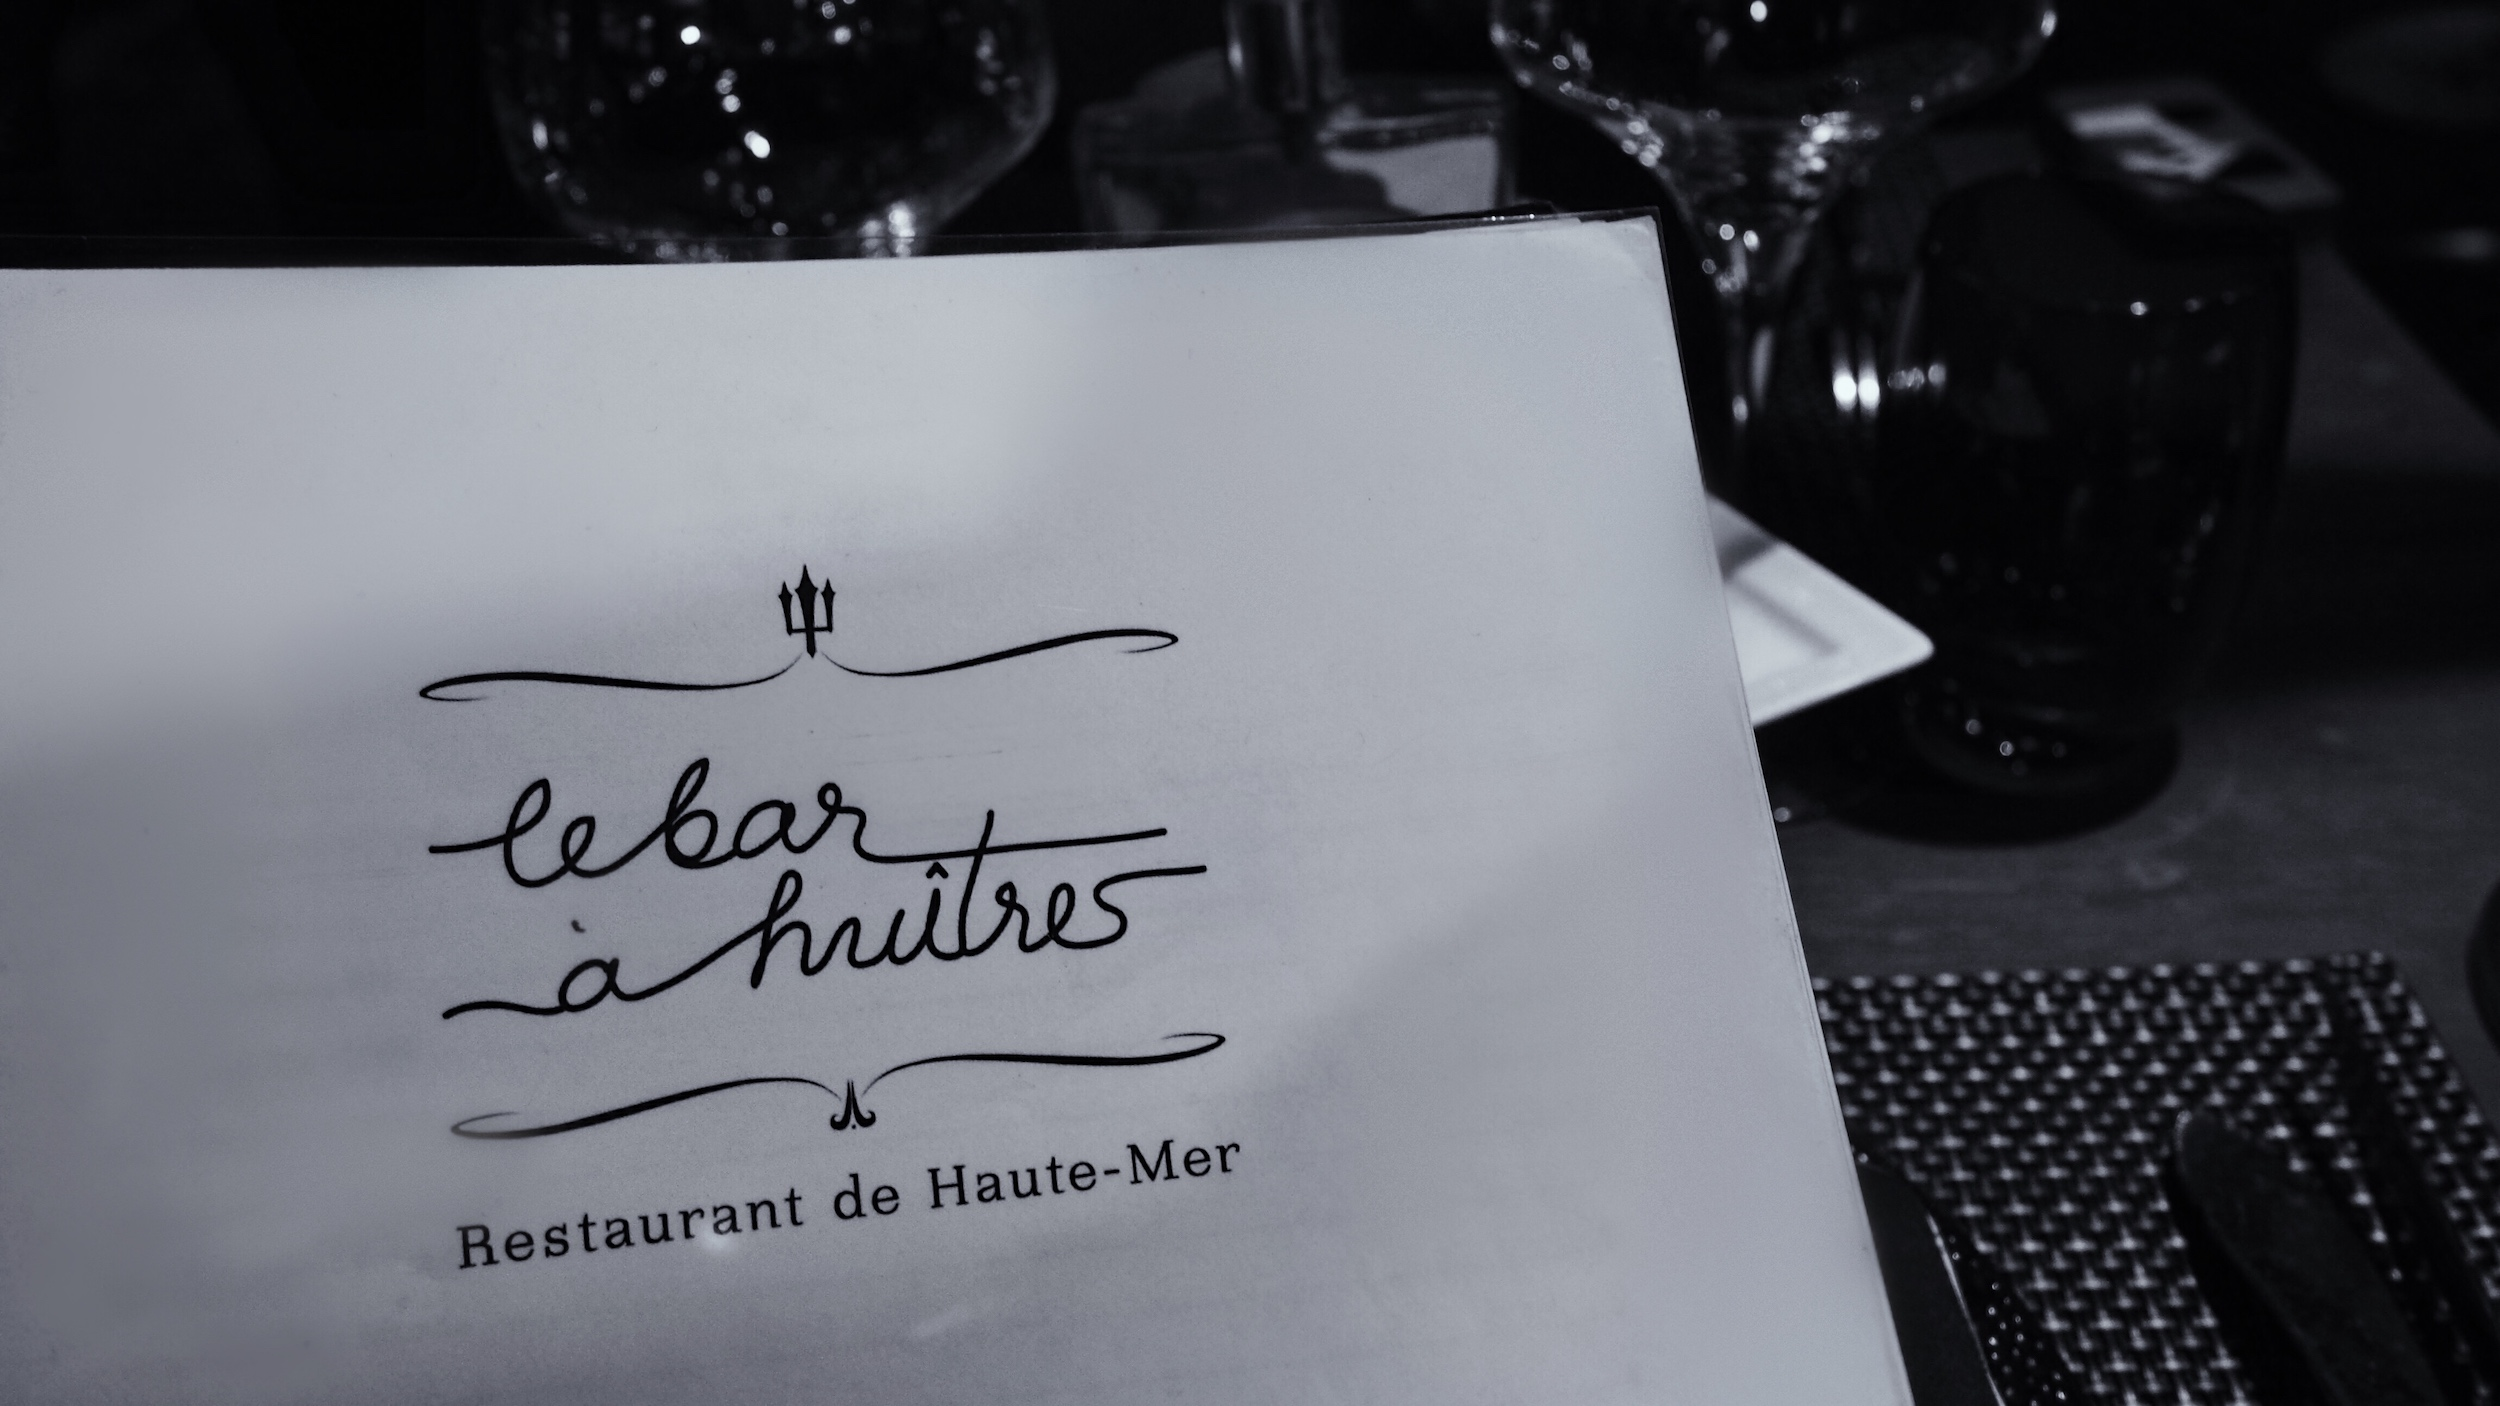 Le Bar à huîtres Montparnasse * Restaurant de Haute-Mer